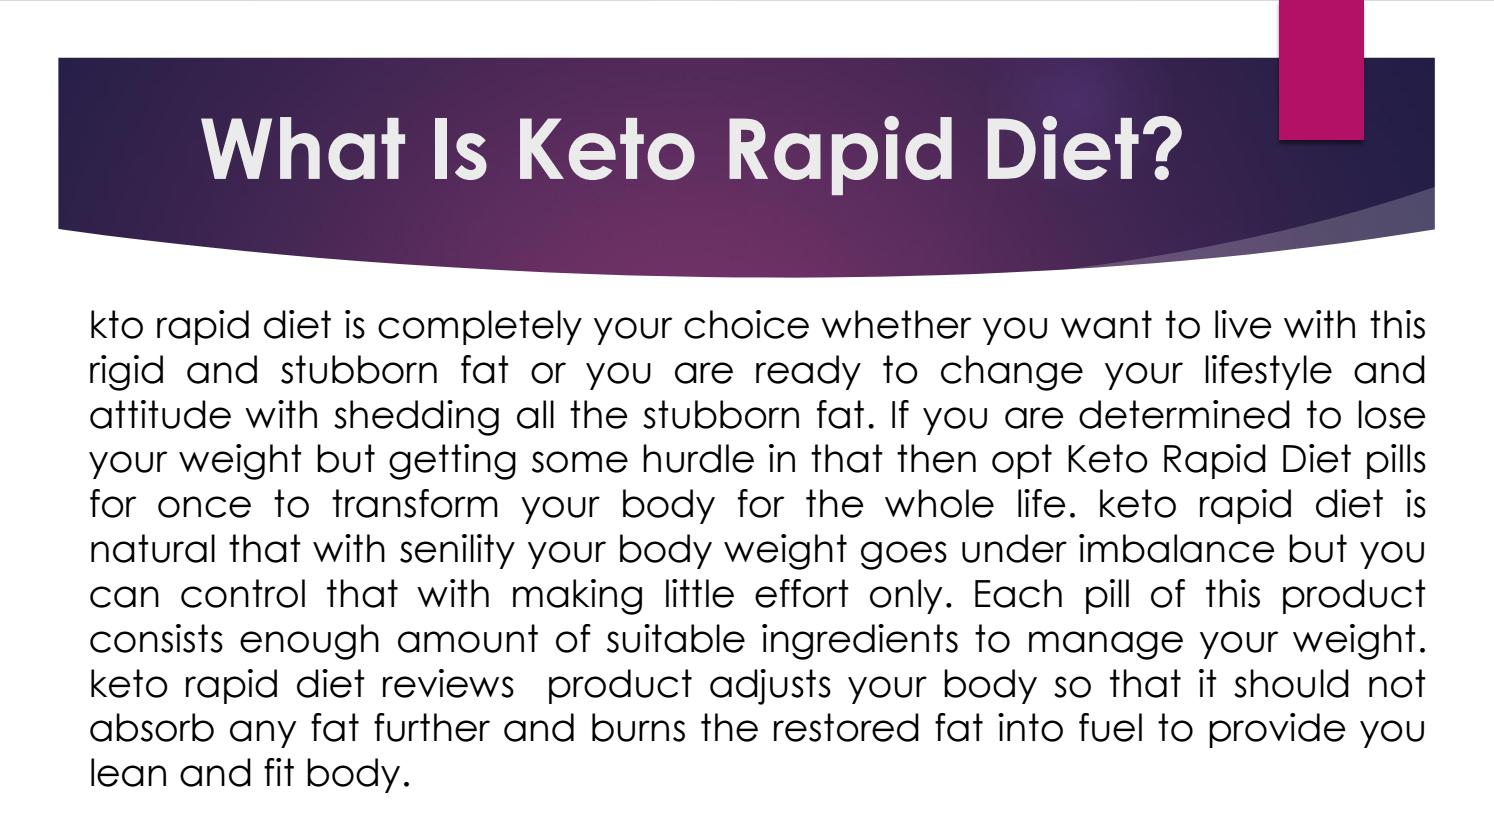 Keto Rapid Diet Keto Rapid Diet Pills By Floridajuriya Issuu